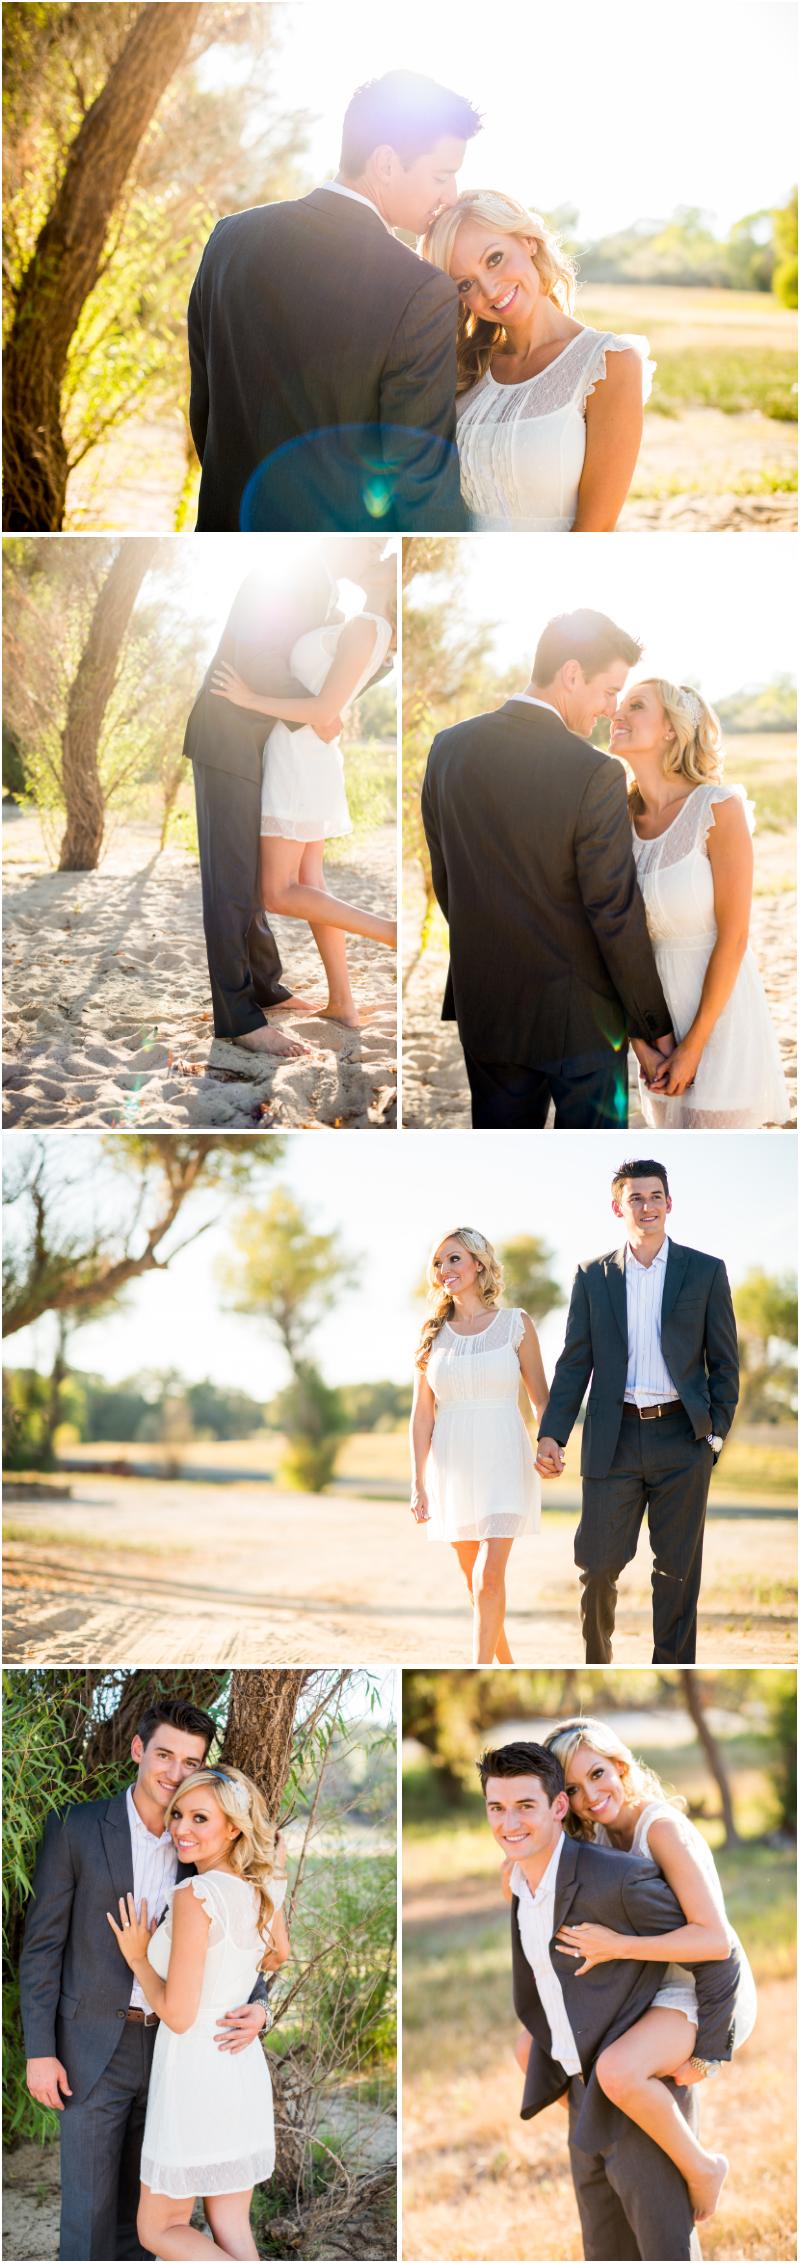 granite bay wedding photographer photographing couple engaged